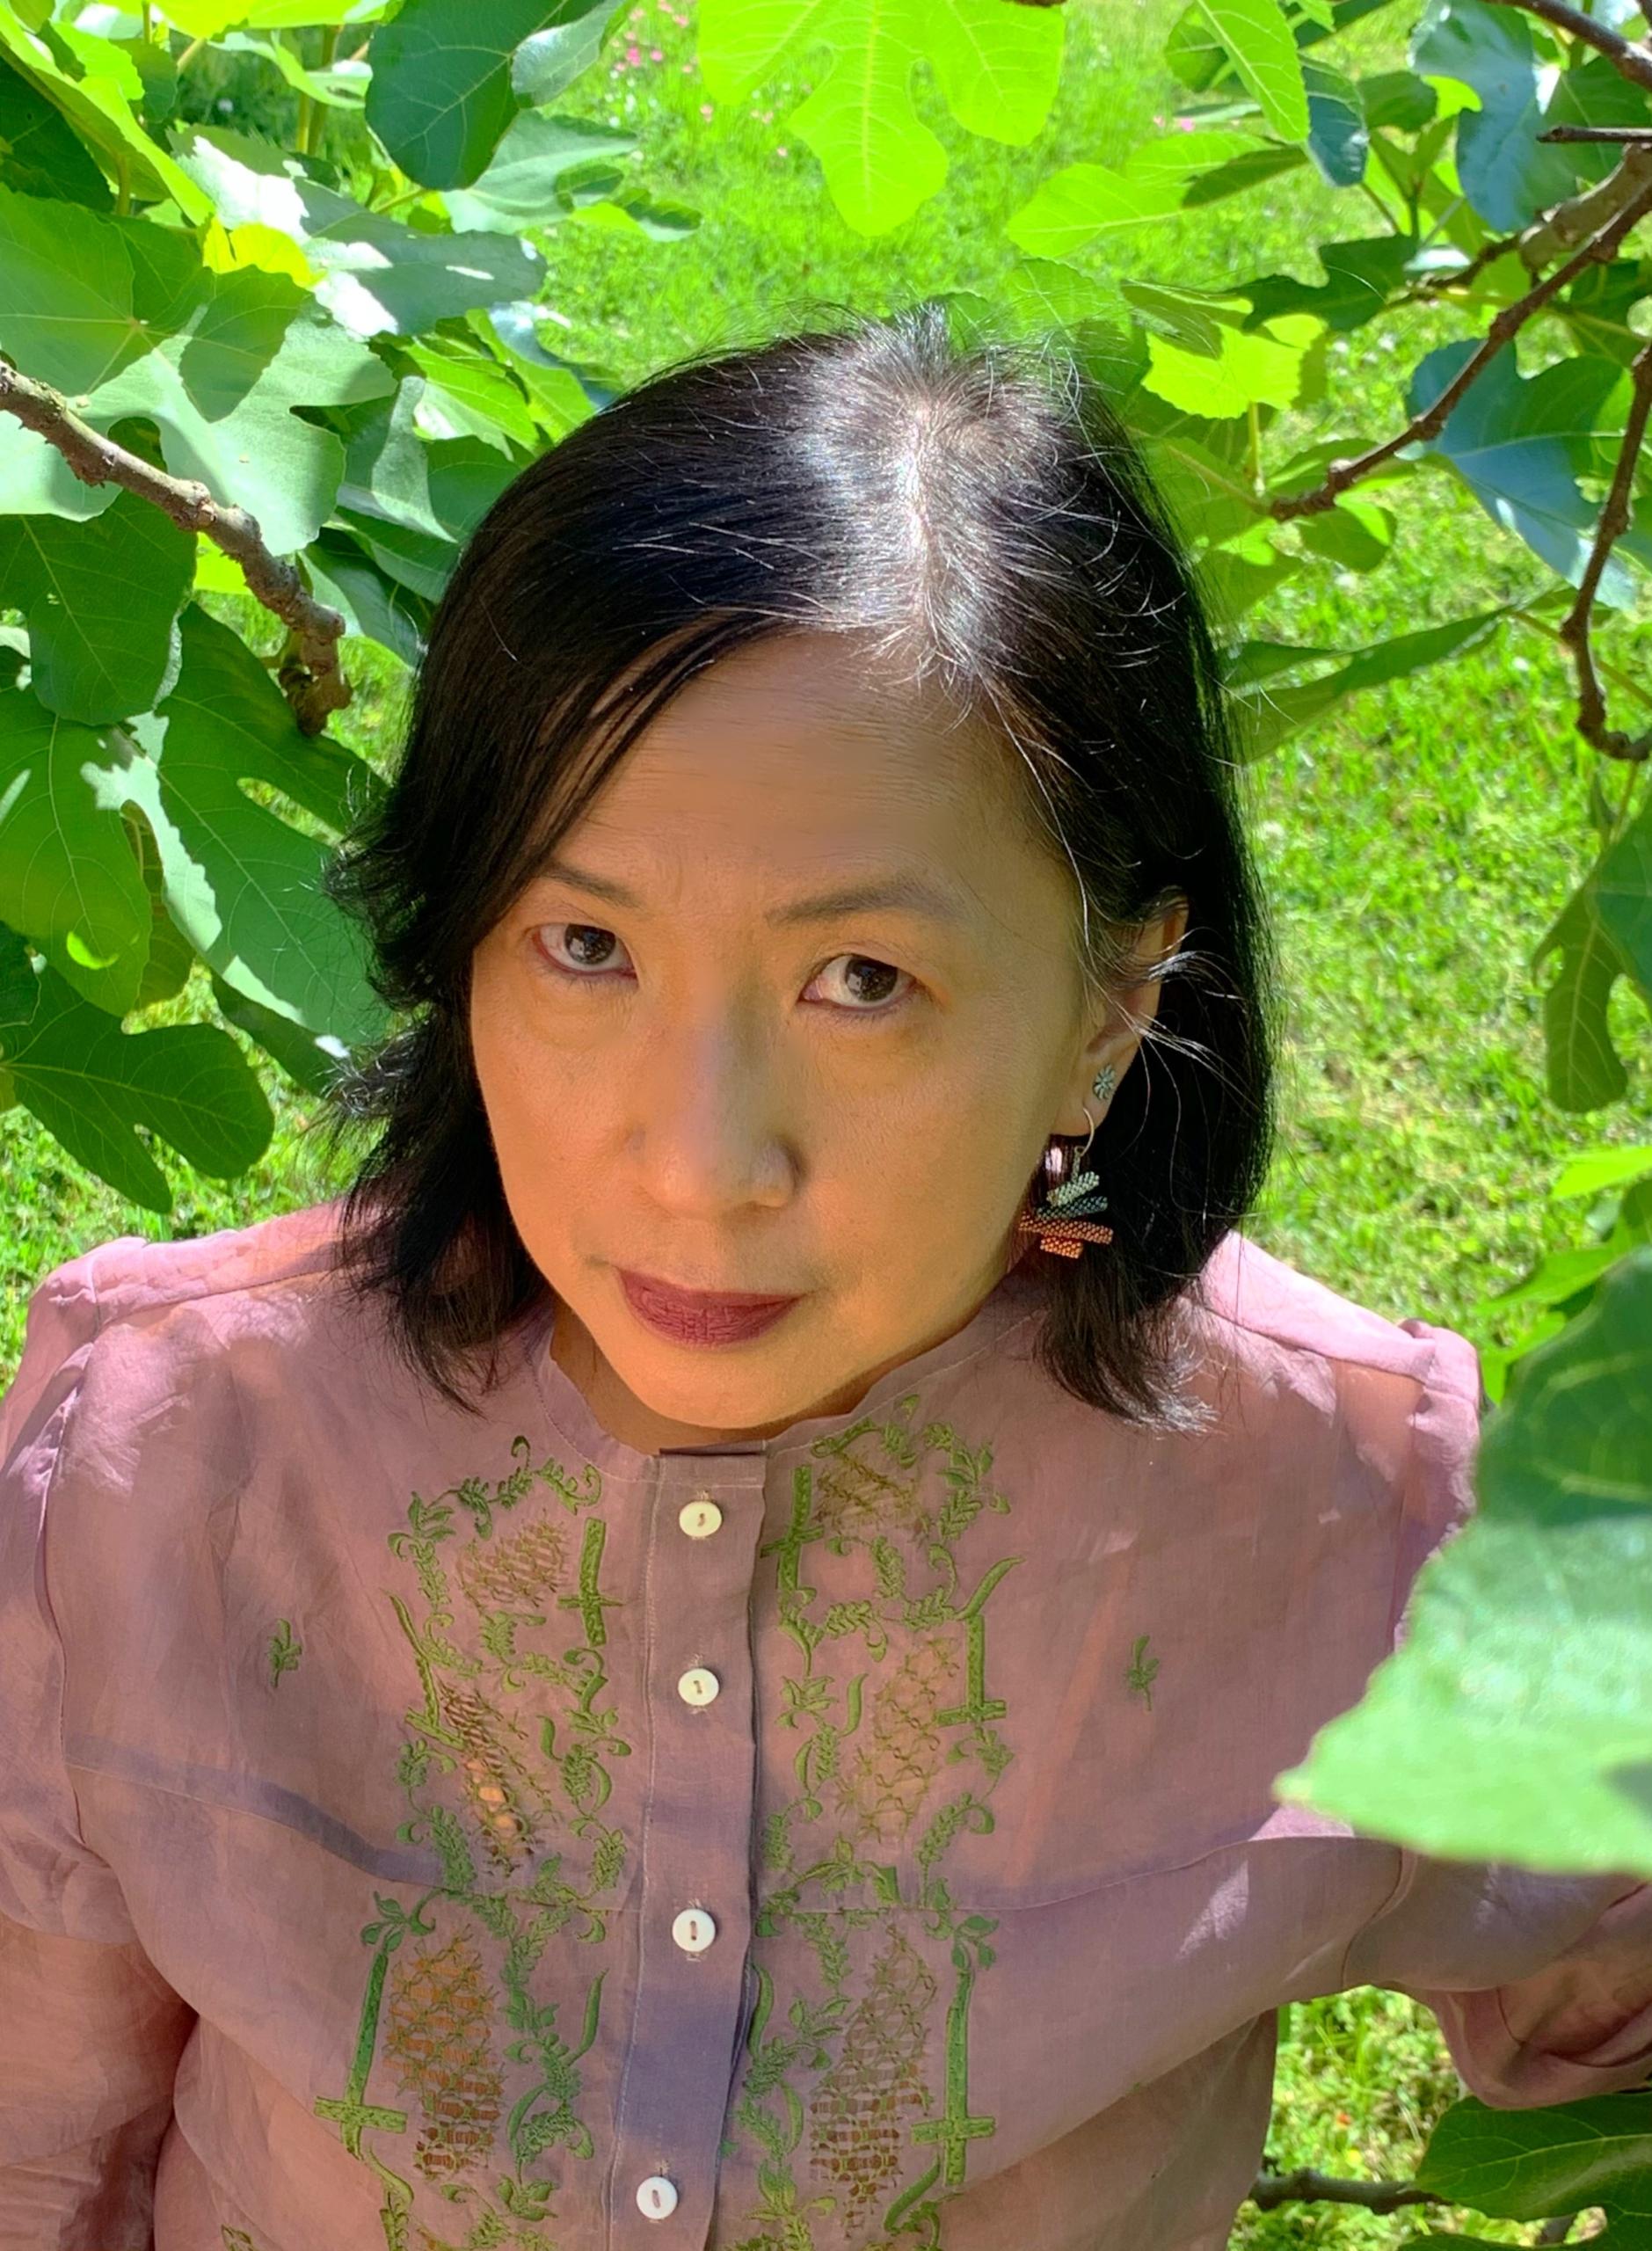 Yona Harvey headshot portrait